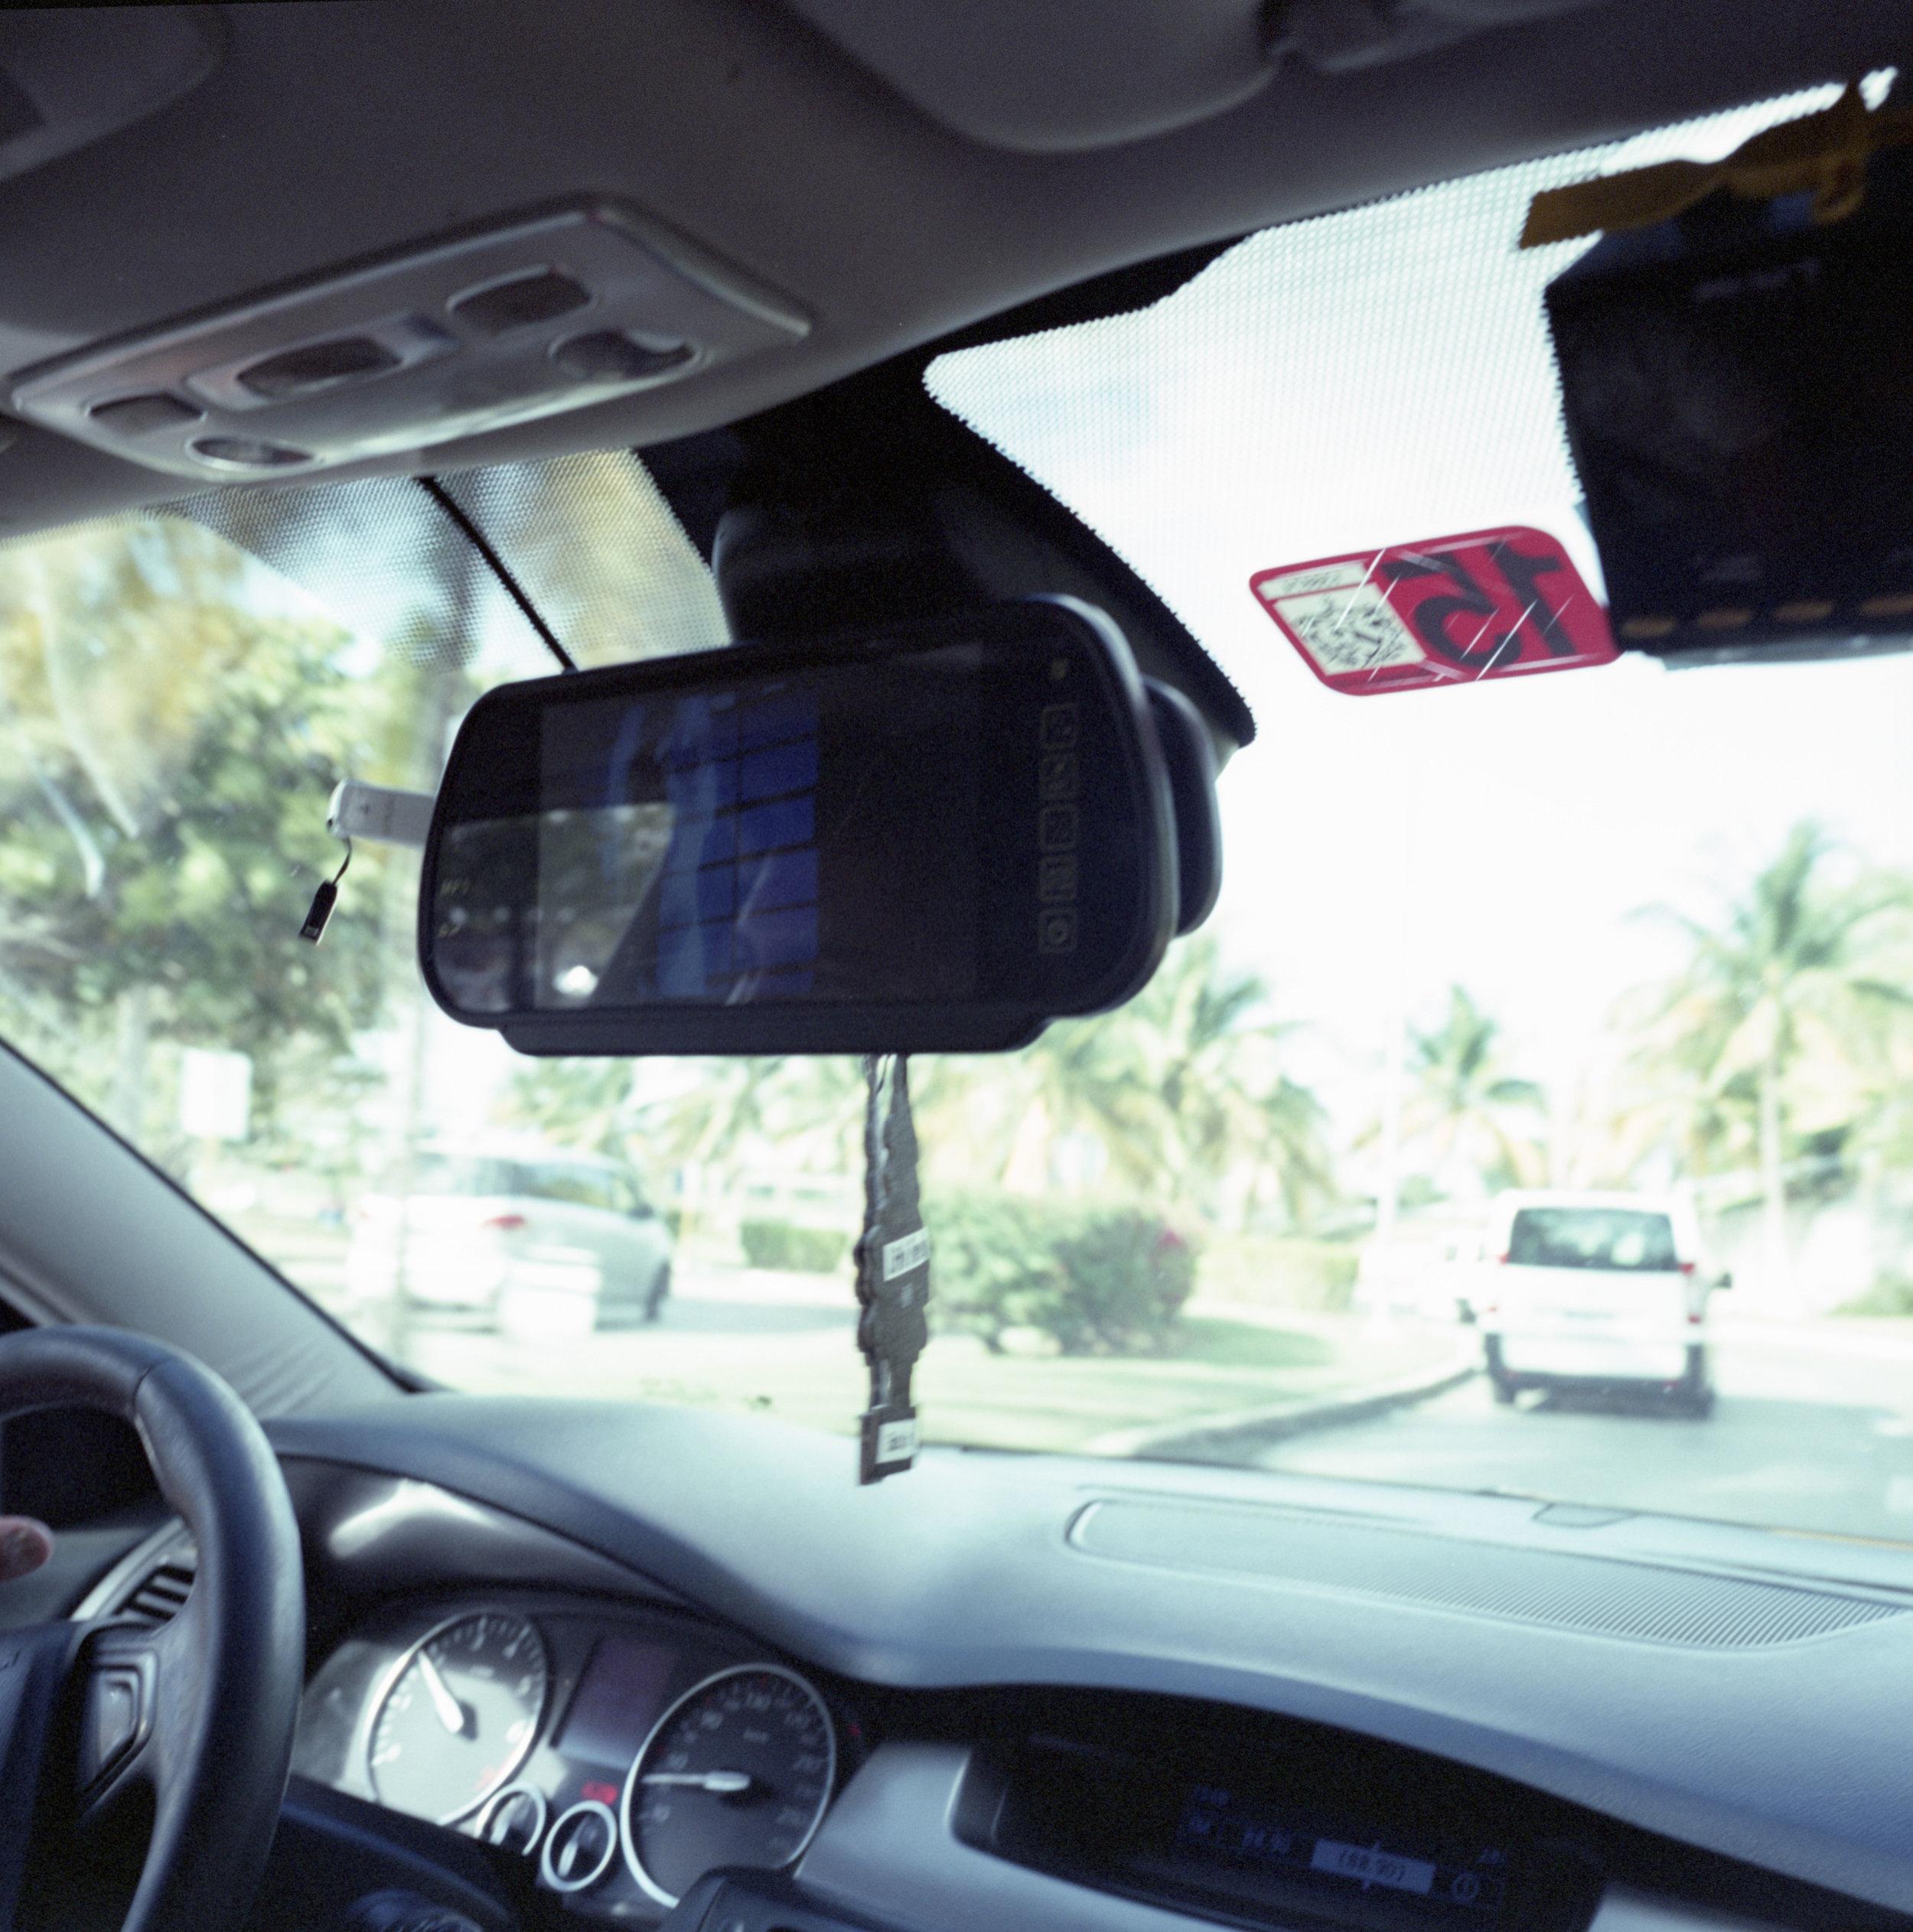 Who needs a rearview GF670w + Fuji Pro800z